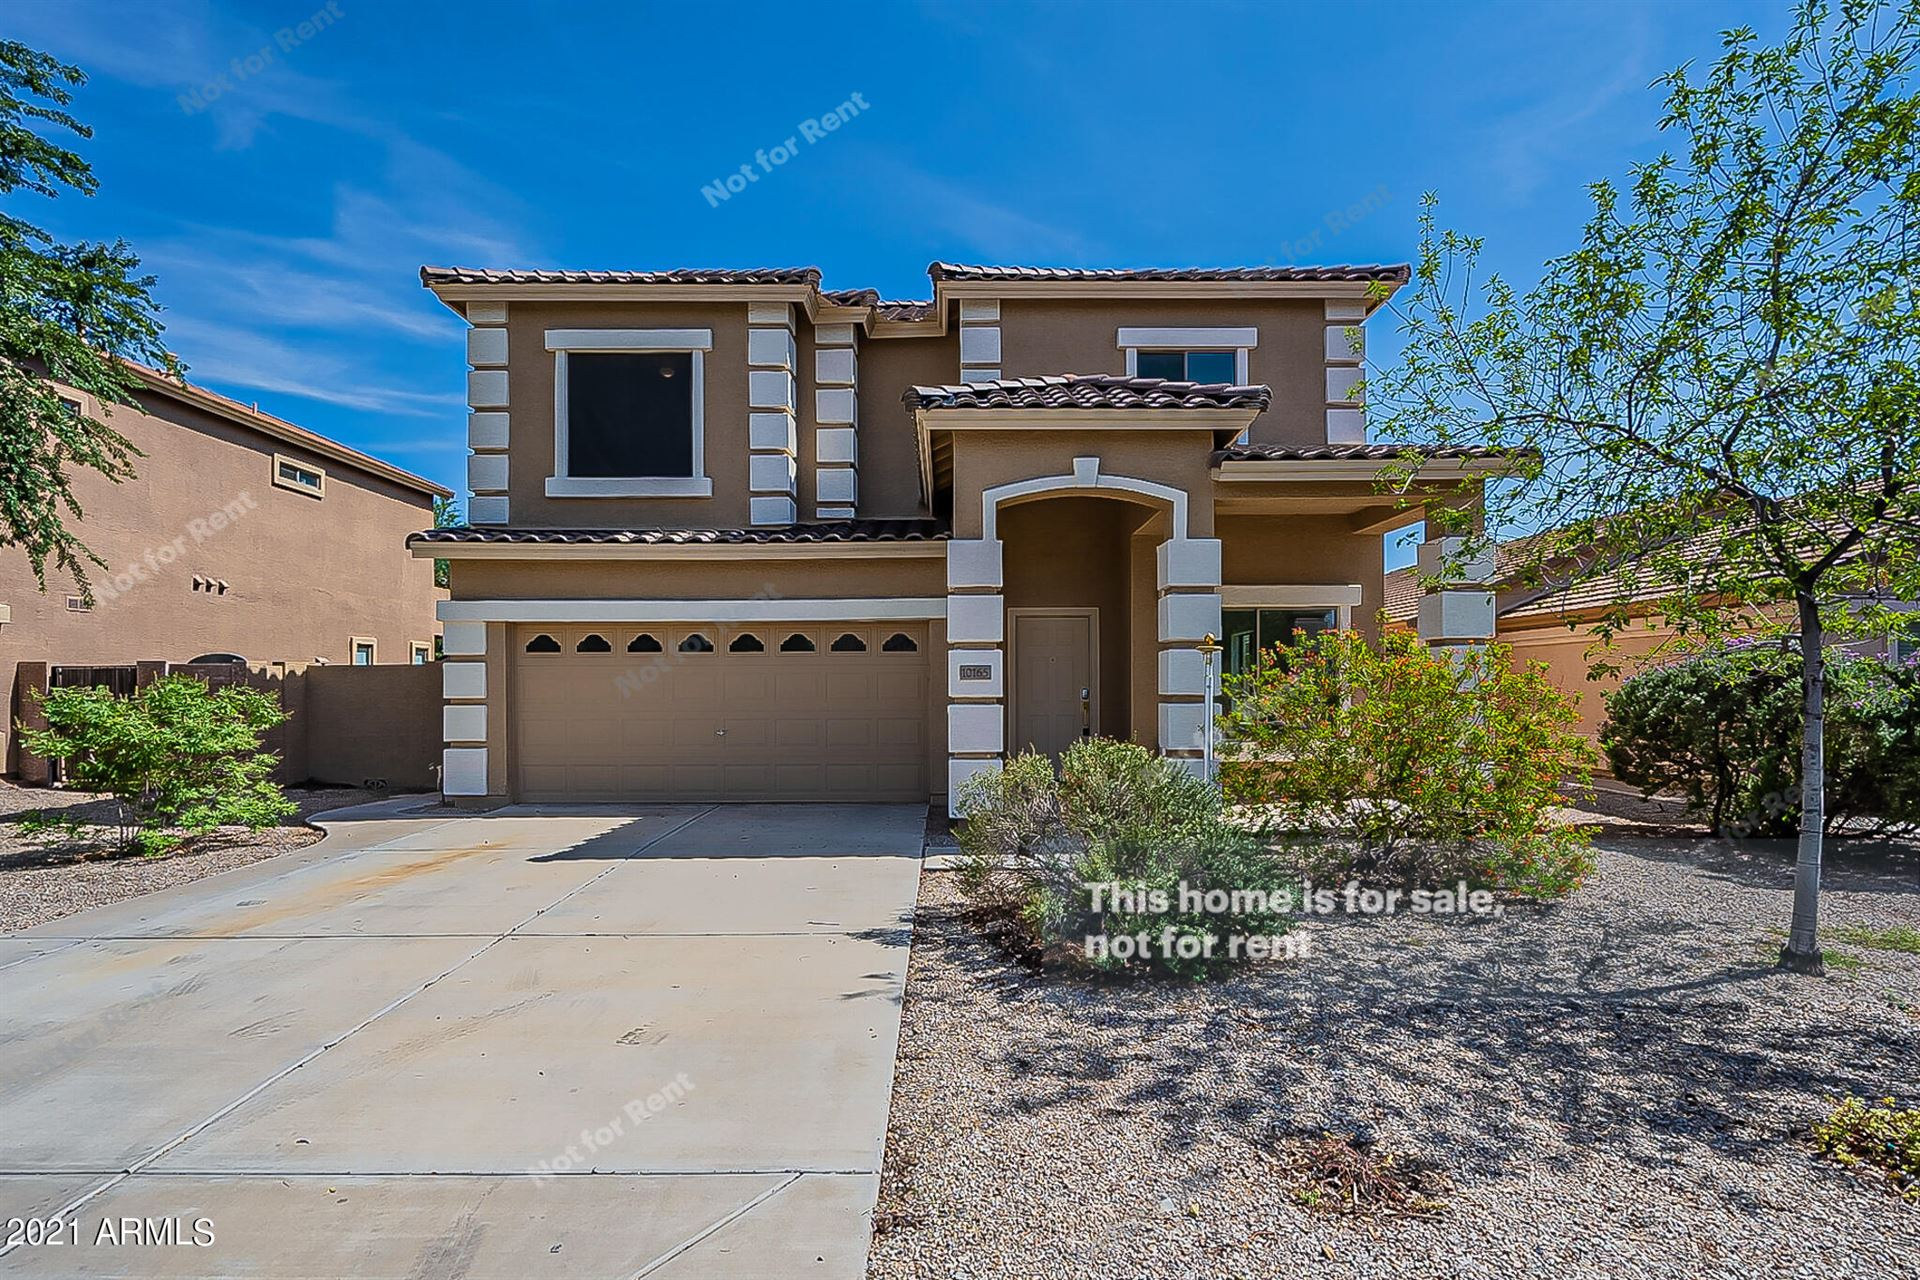 10165 E KNOWLES Avenue, Mesa, AZ 85209 - MLS#: 6271794